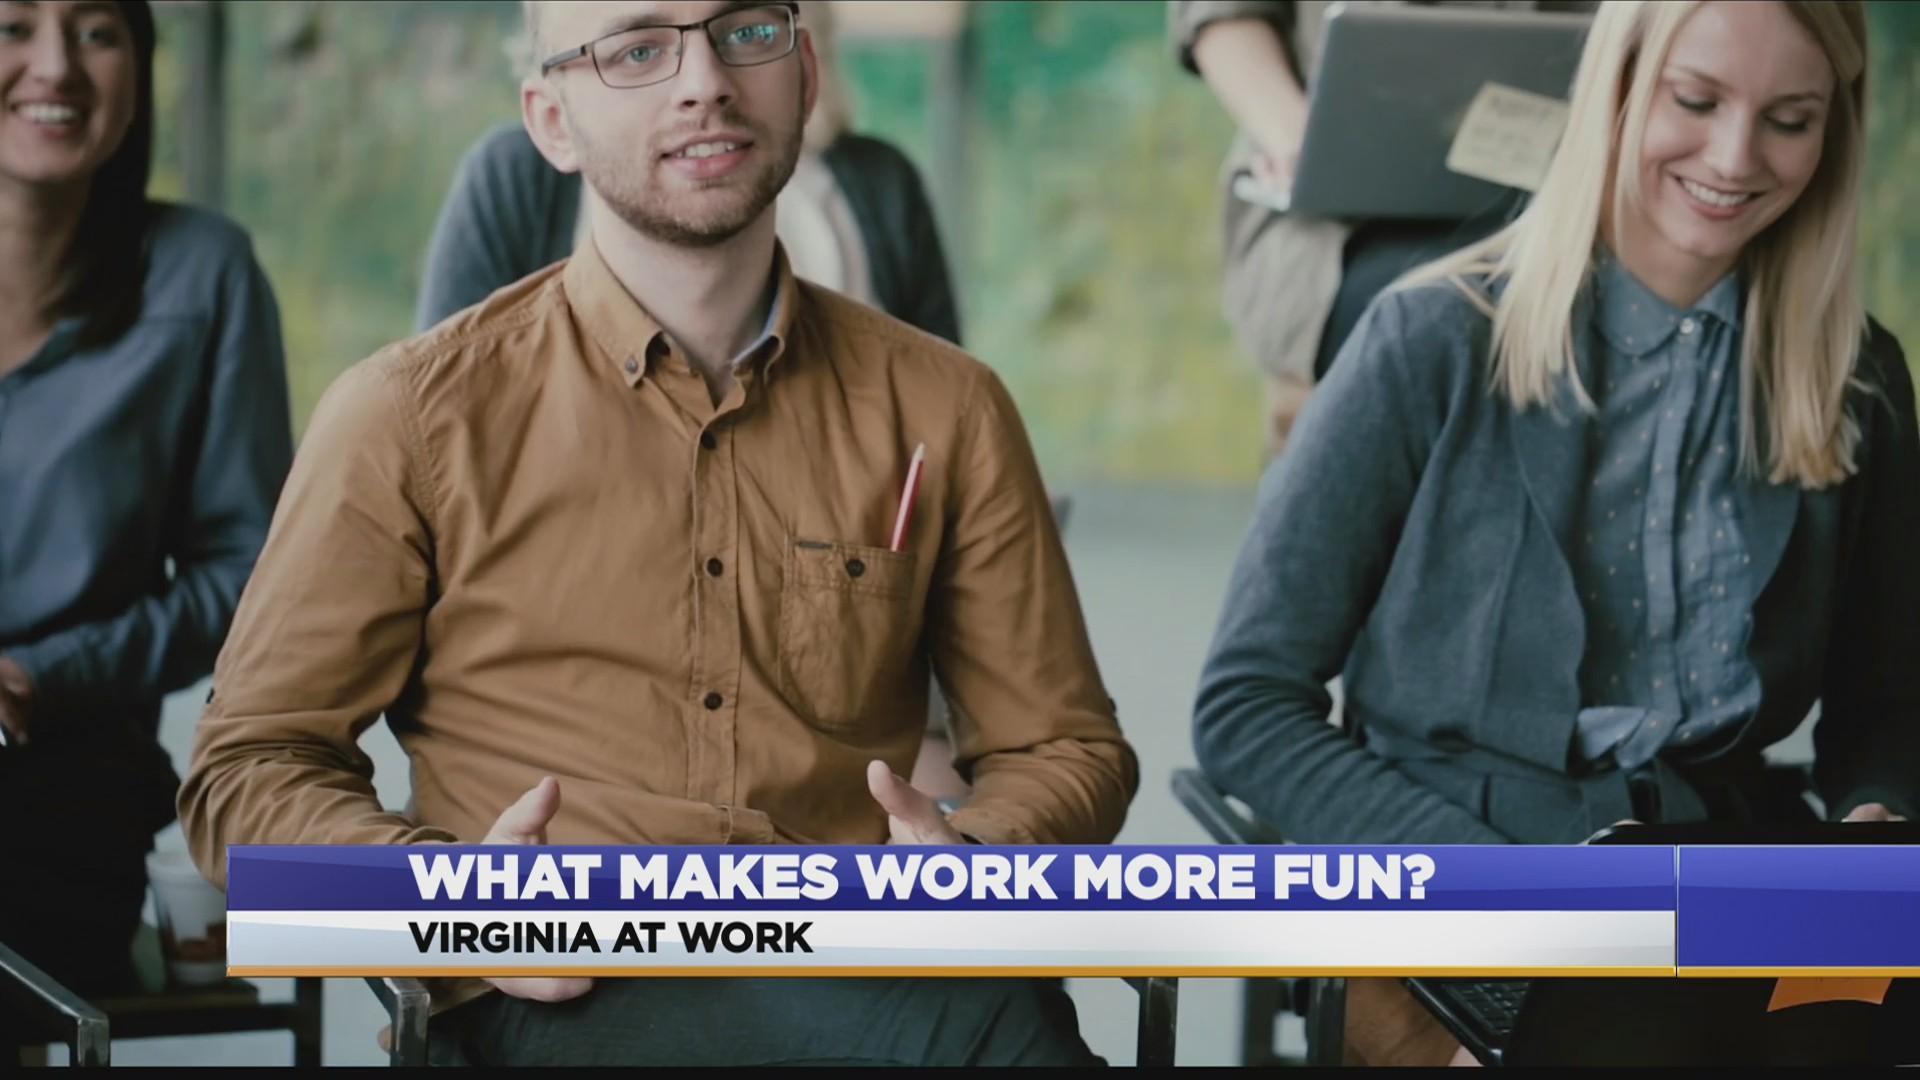 Virginia At Work: How to make work more fun